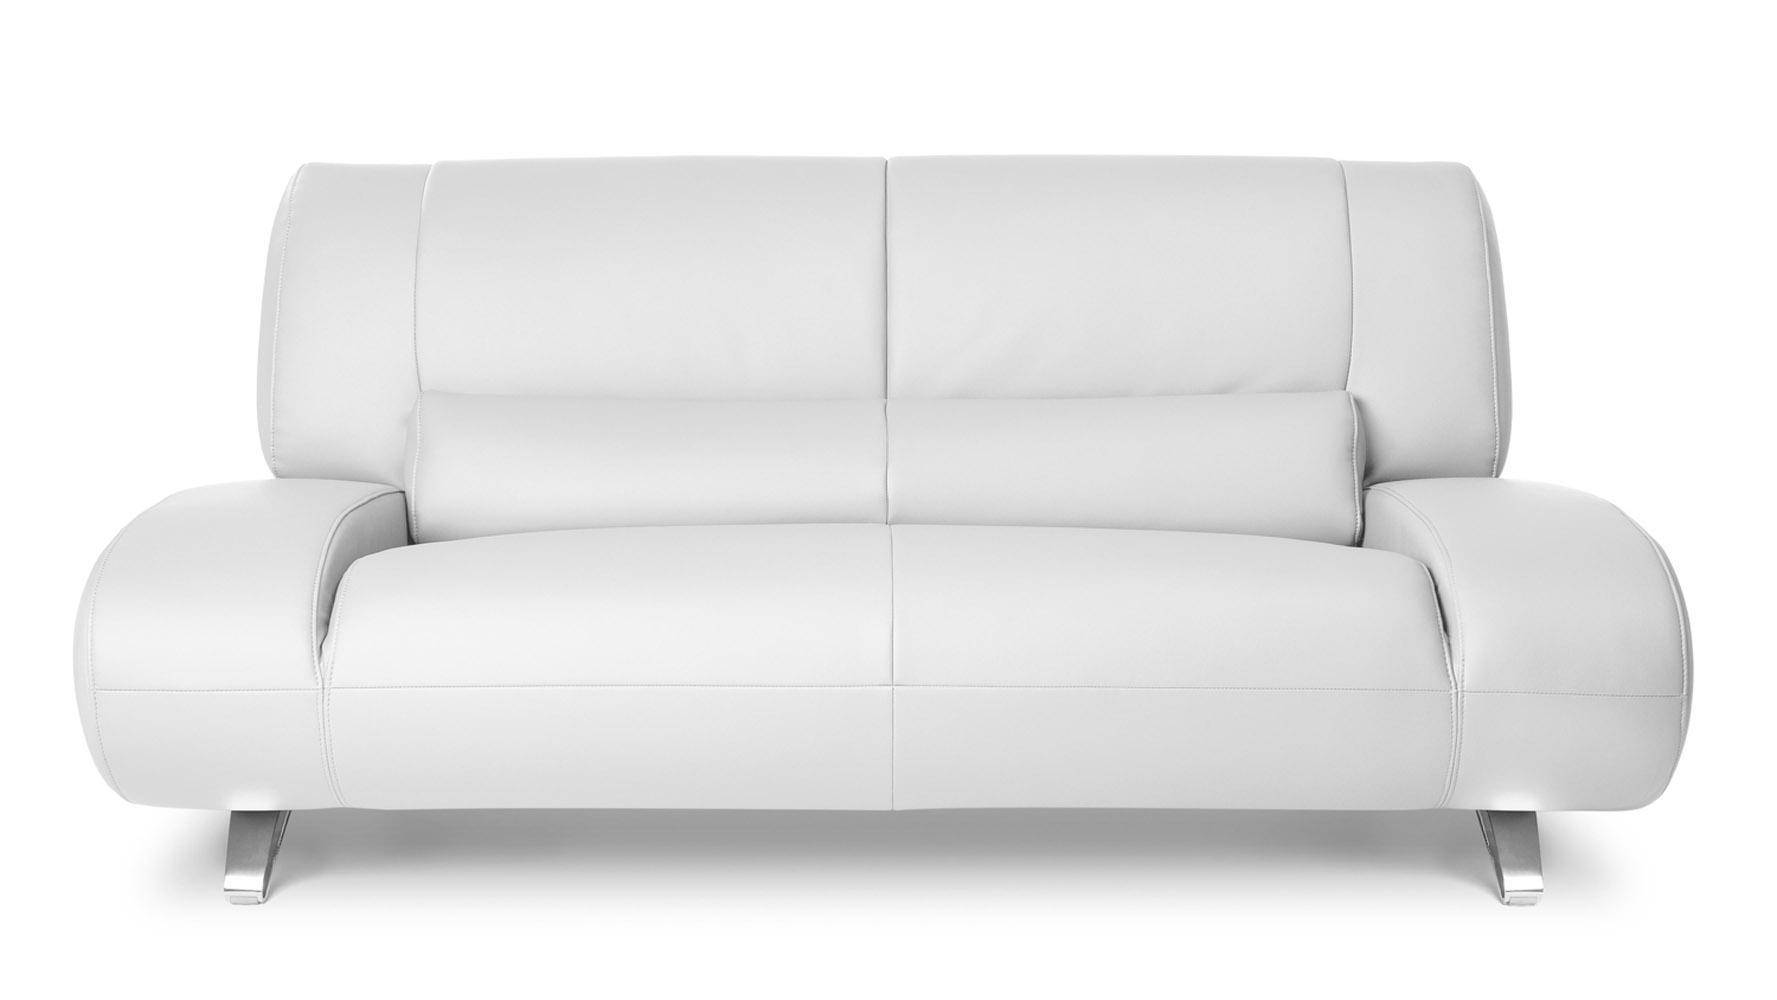 Aspen 2 Seater | Zuri Furniture With Aspen Leather Sofas (Image 1 of 20)